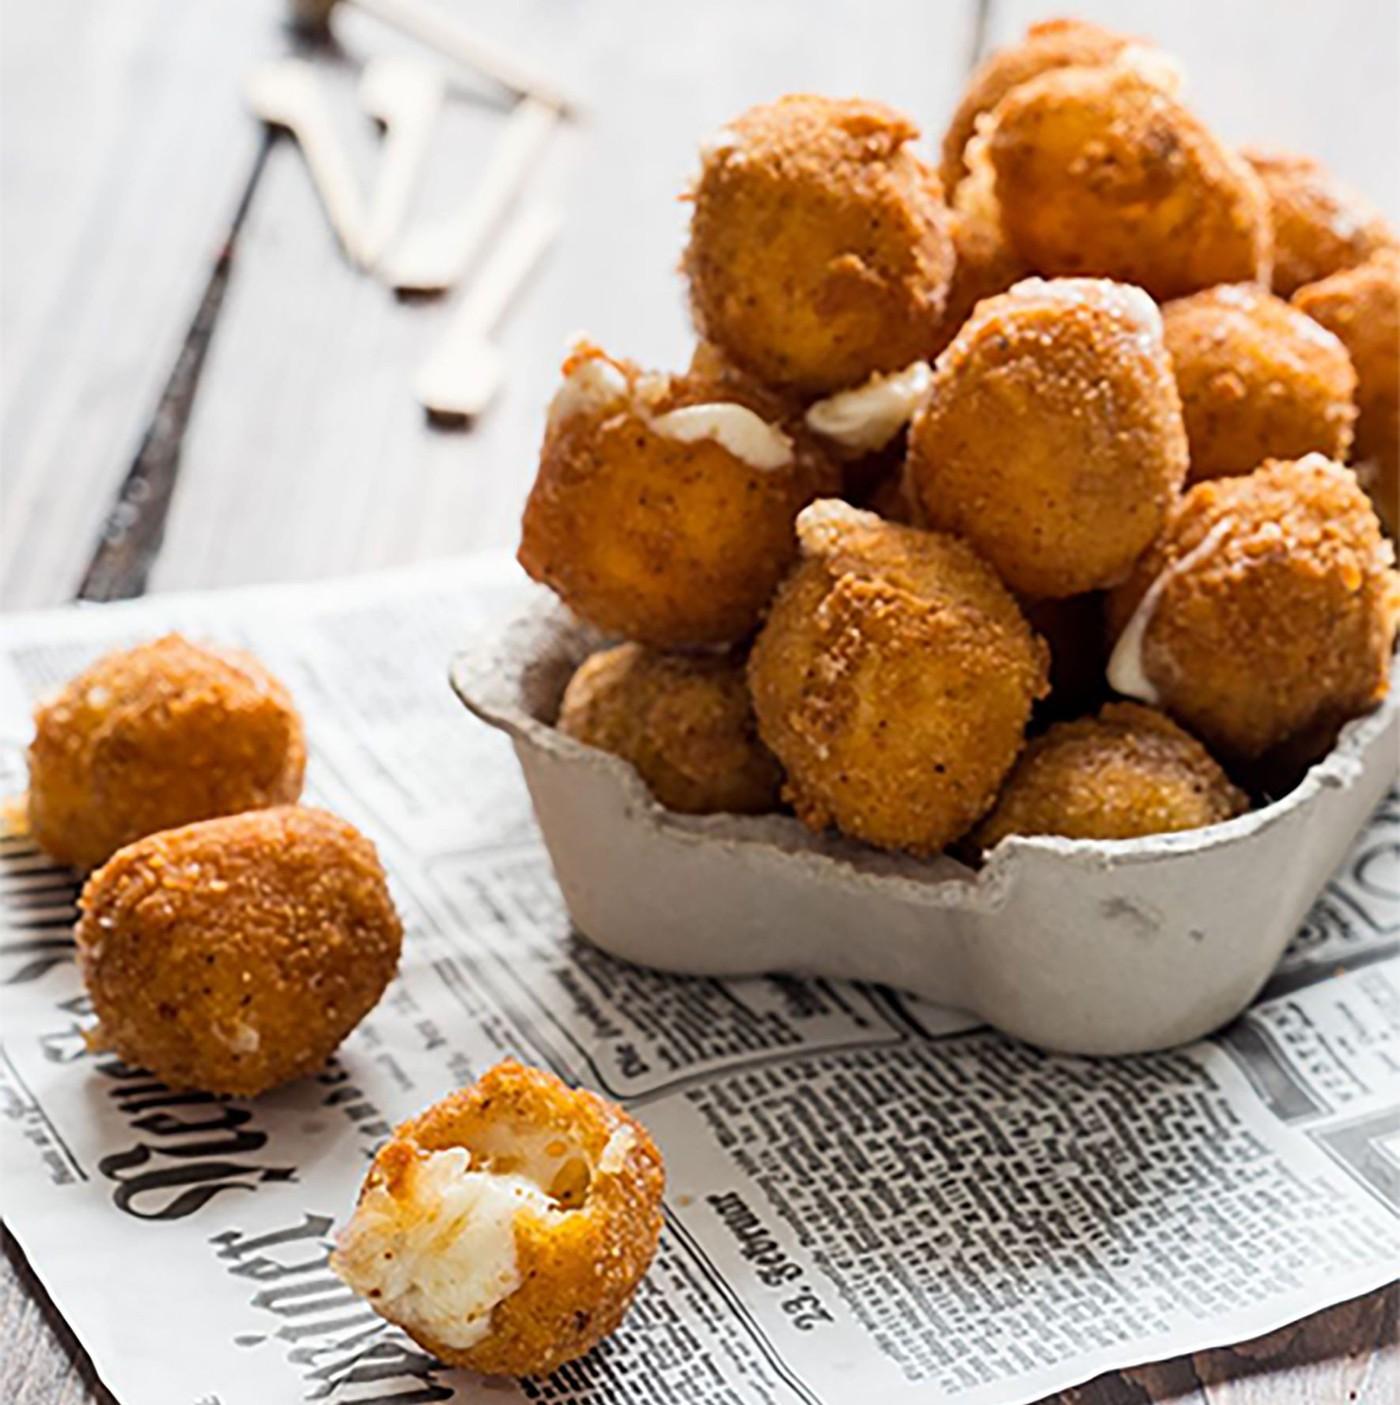 receta de Mozzarelline panate prefritte